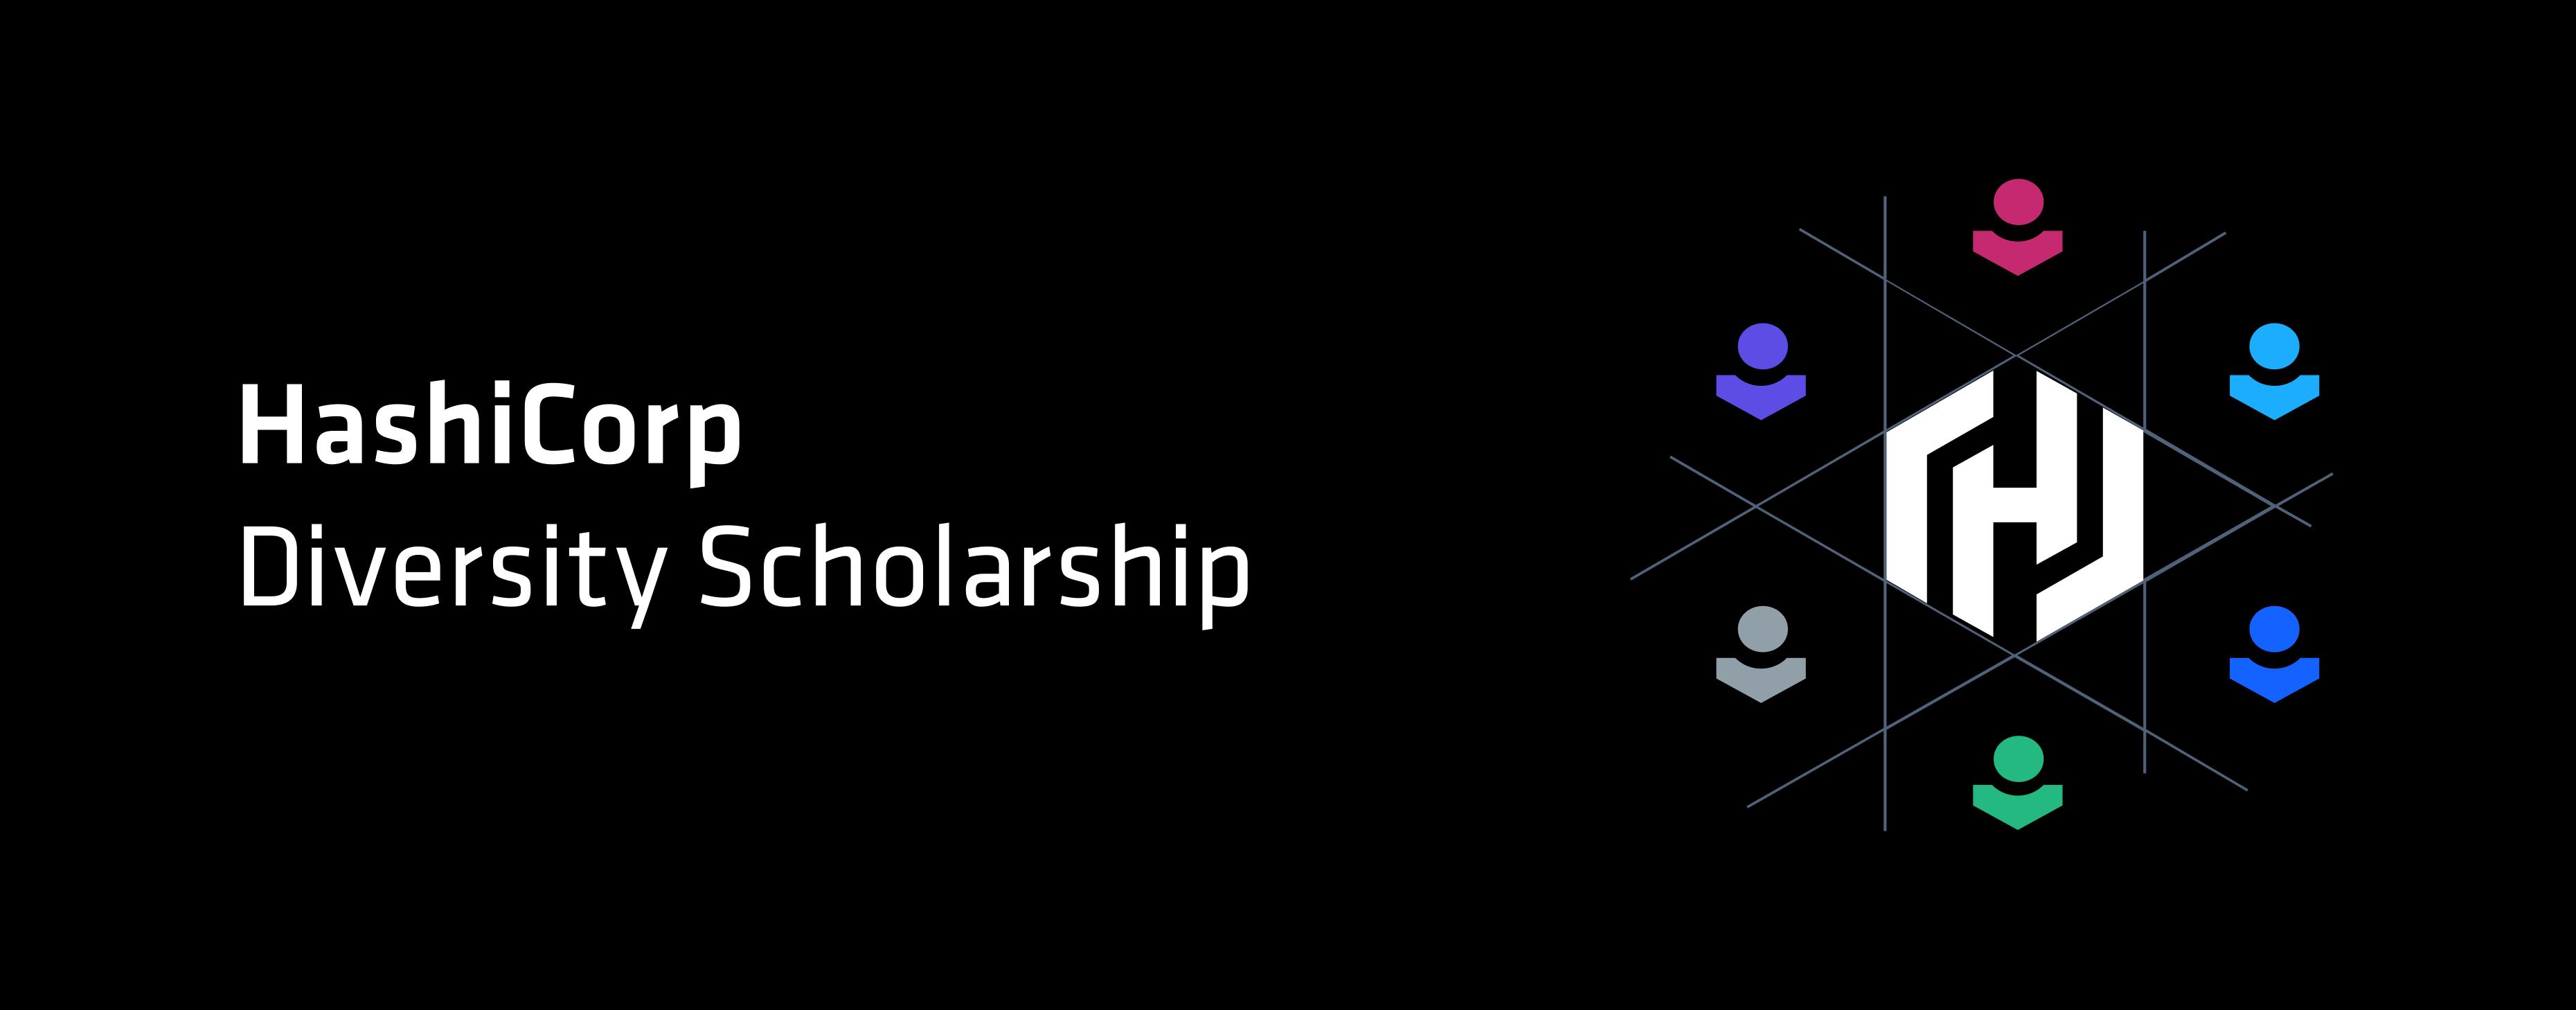 Announcing HashiCorp Diversity Scholarship Program